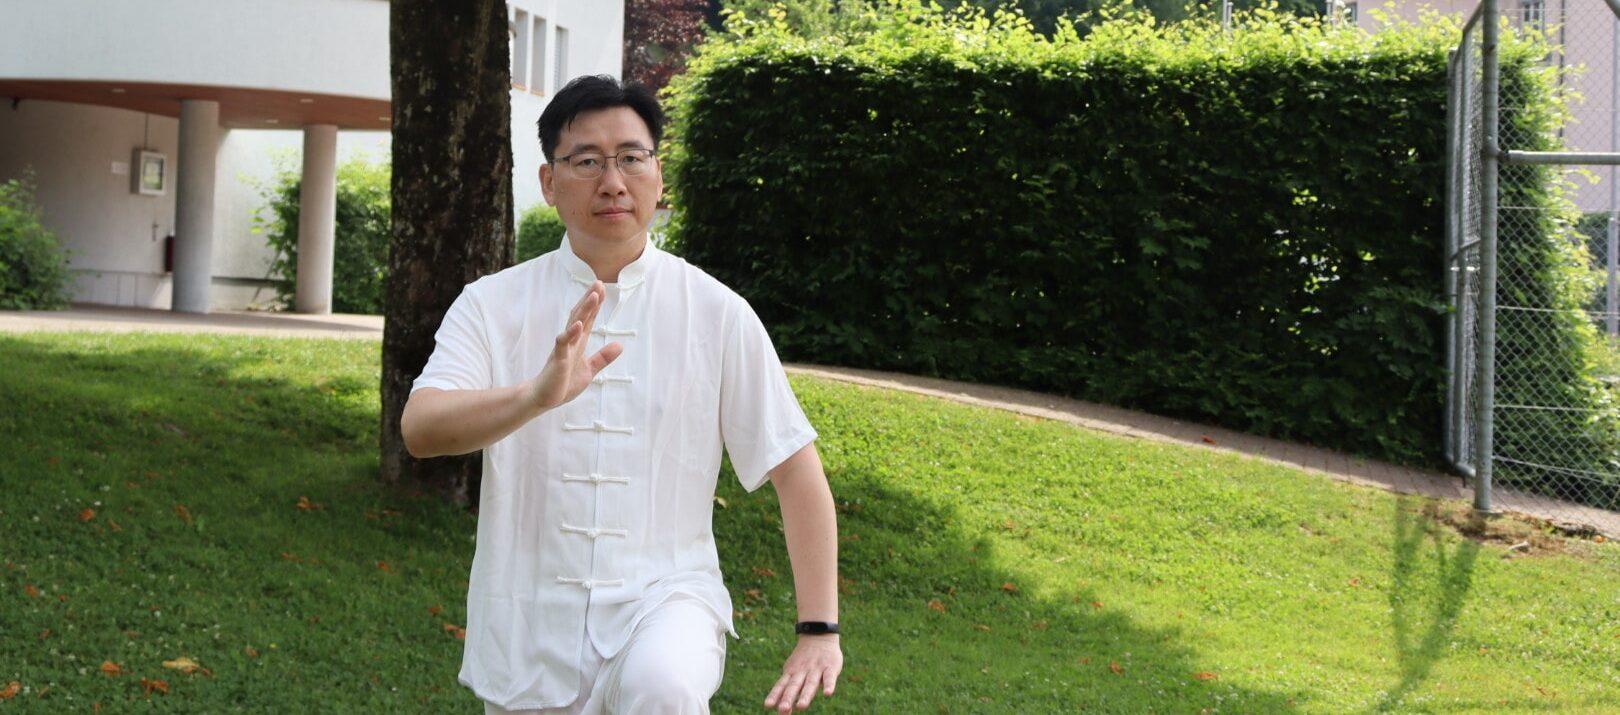 Therapeut Zhijun Chen beim Taiji (Taichi)